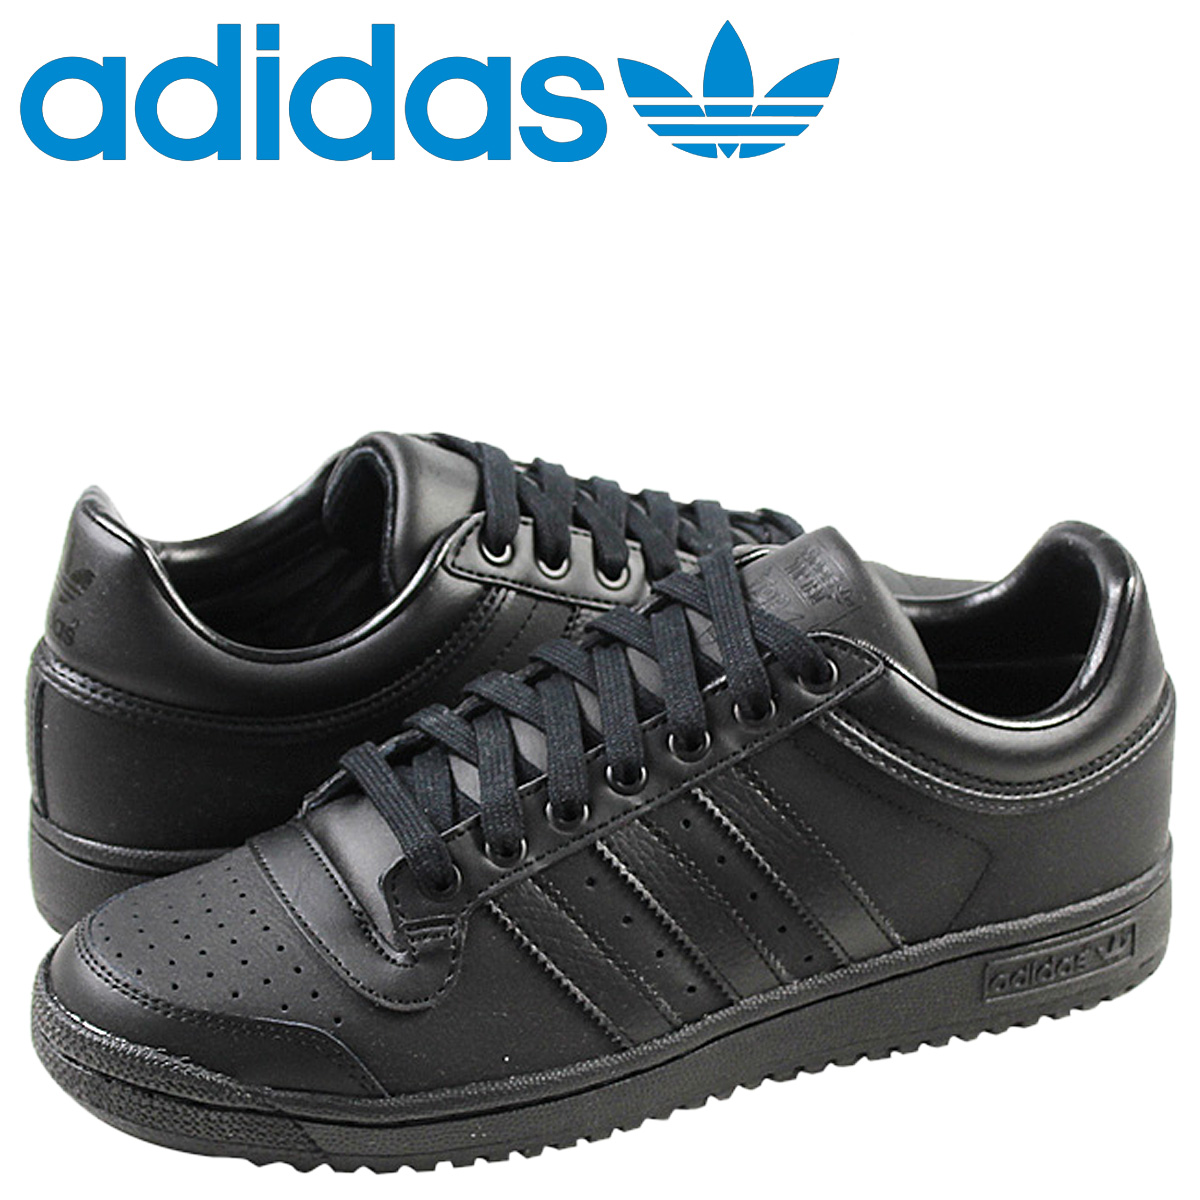 adidas Originals Adidas original stop ten low sneakers TOP TEN LOW D69291 men gap Dis shoes black